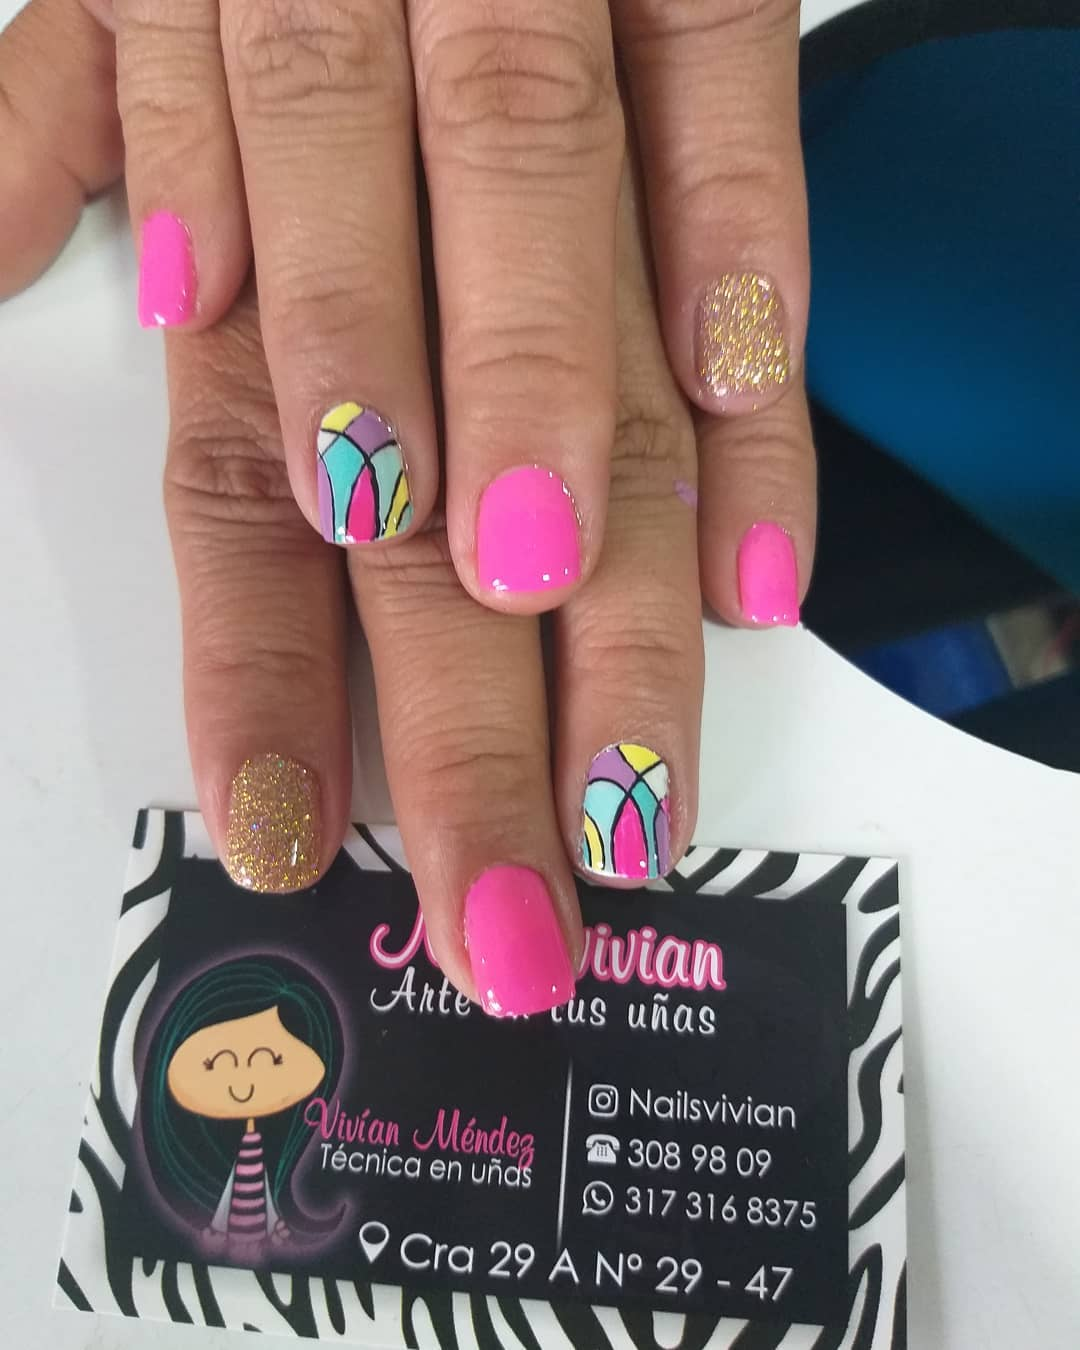 #manicure #manicure #handprints # decoraçãodeuñas #decoraciondemanos #amorpropi ...